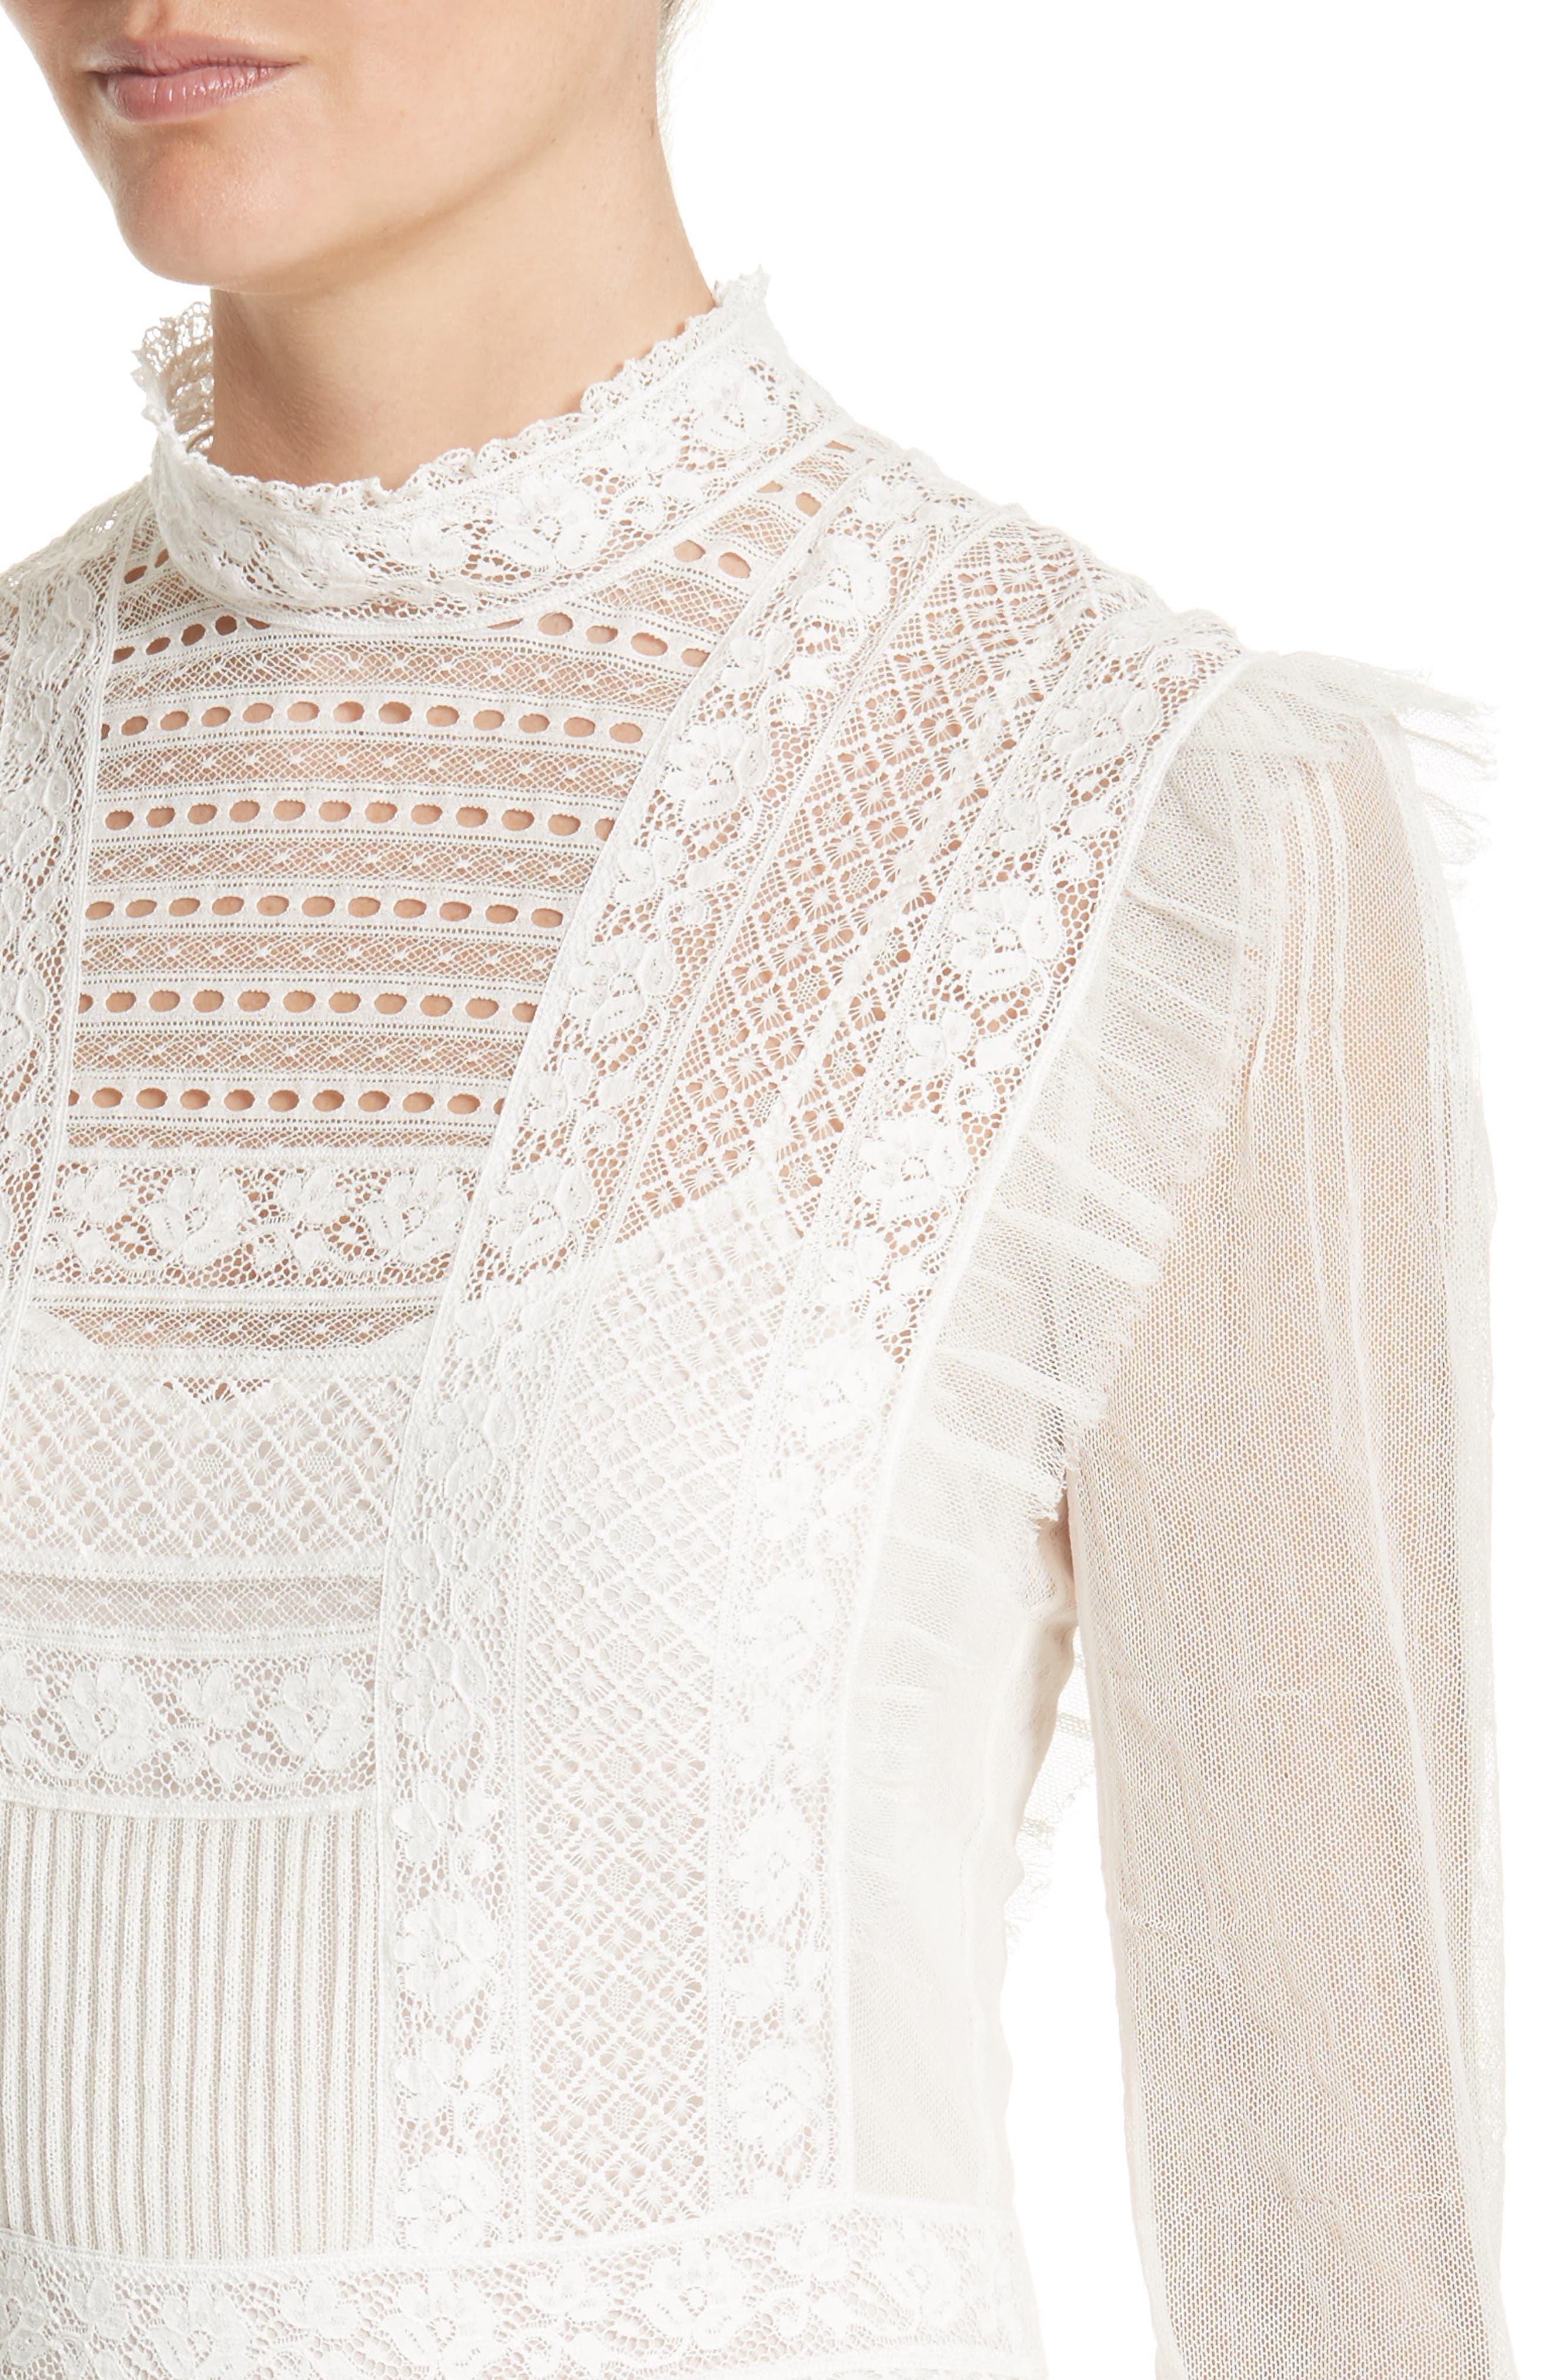 Chanella Lace Midi Dress,                             Alternate thumbnail 4, color,                             100